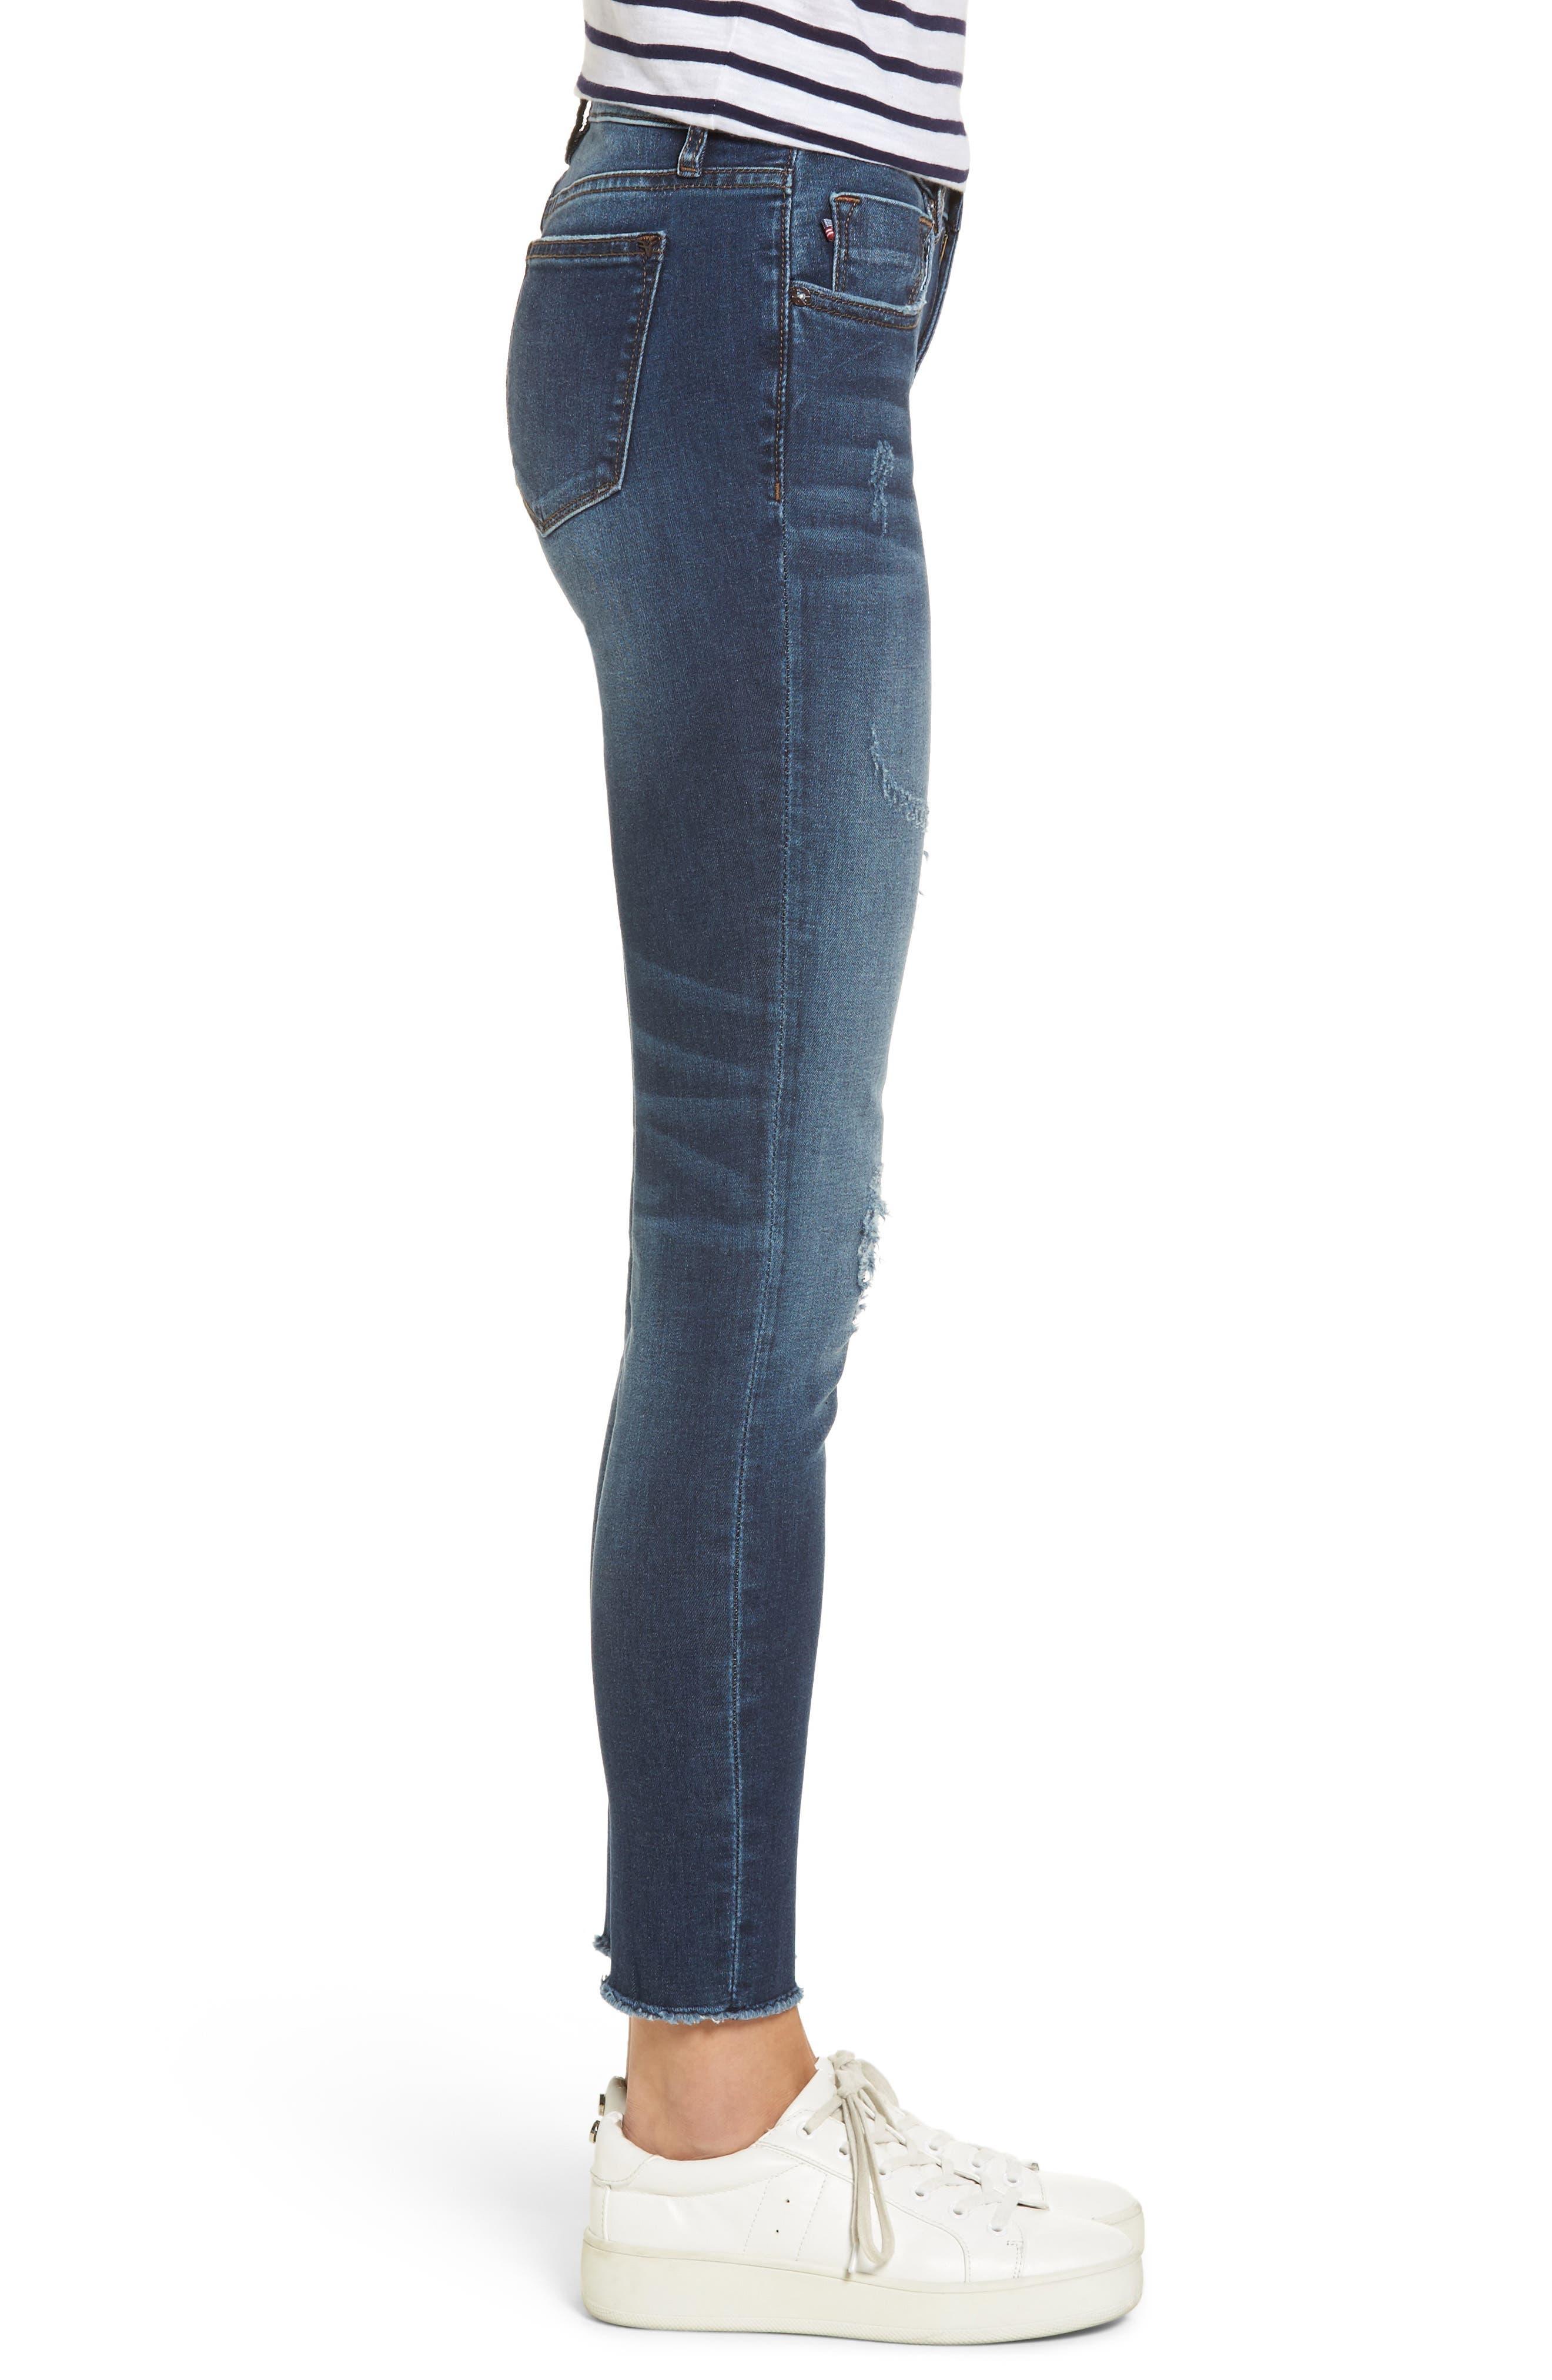 Alternate Image 3  - Vigoss Jagger Distressed Skinny Jeans